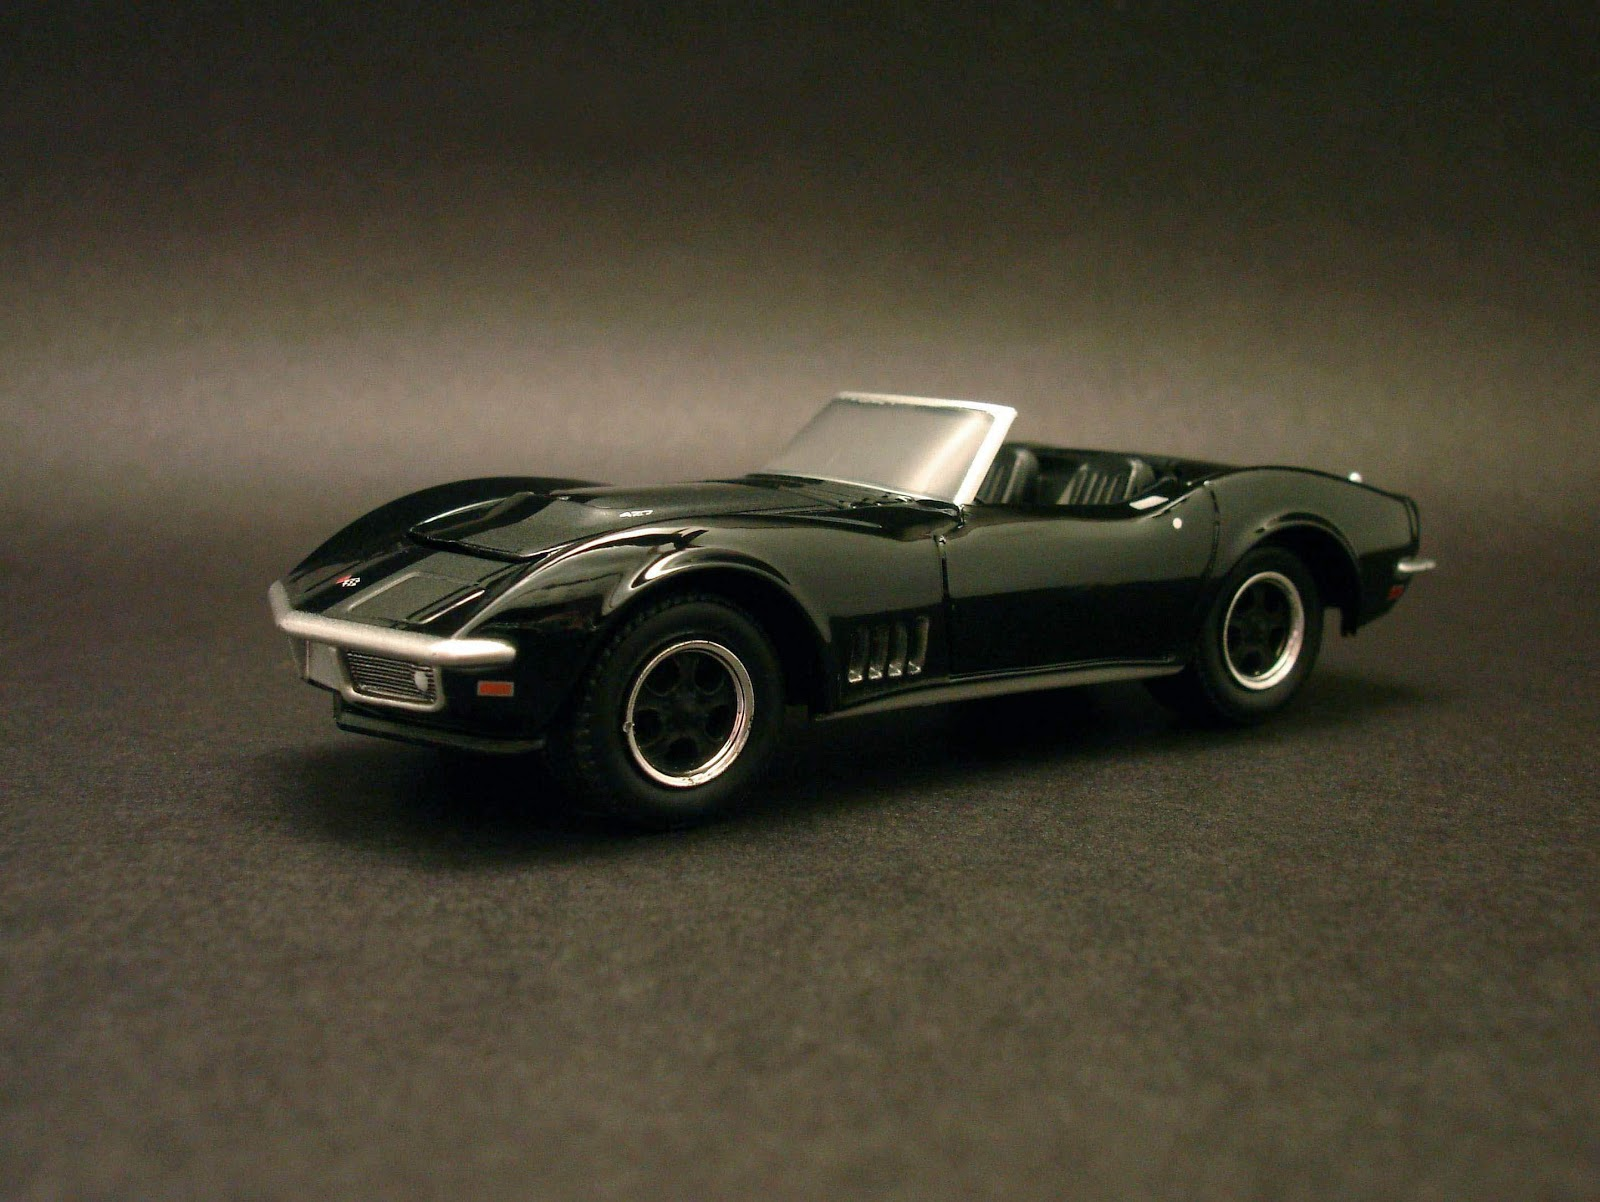 Diecast Hobbist 1968 Chevrolet Corvette Convertible Crew Cab 164 Scale From Greenlight Black Bandit Toysrus Exclusive Edition